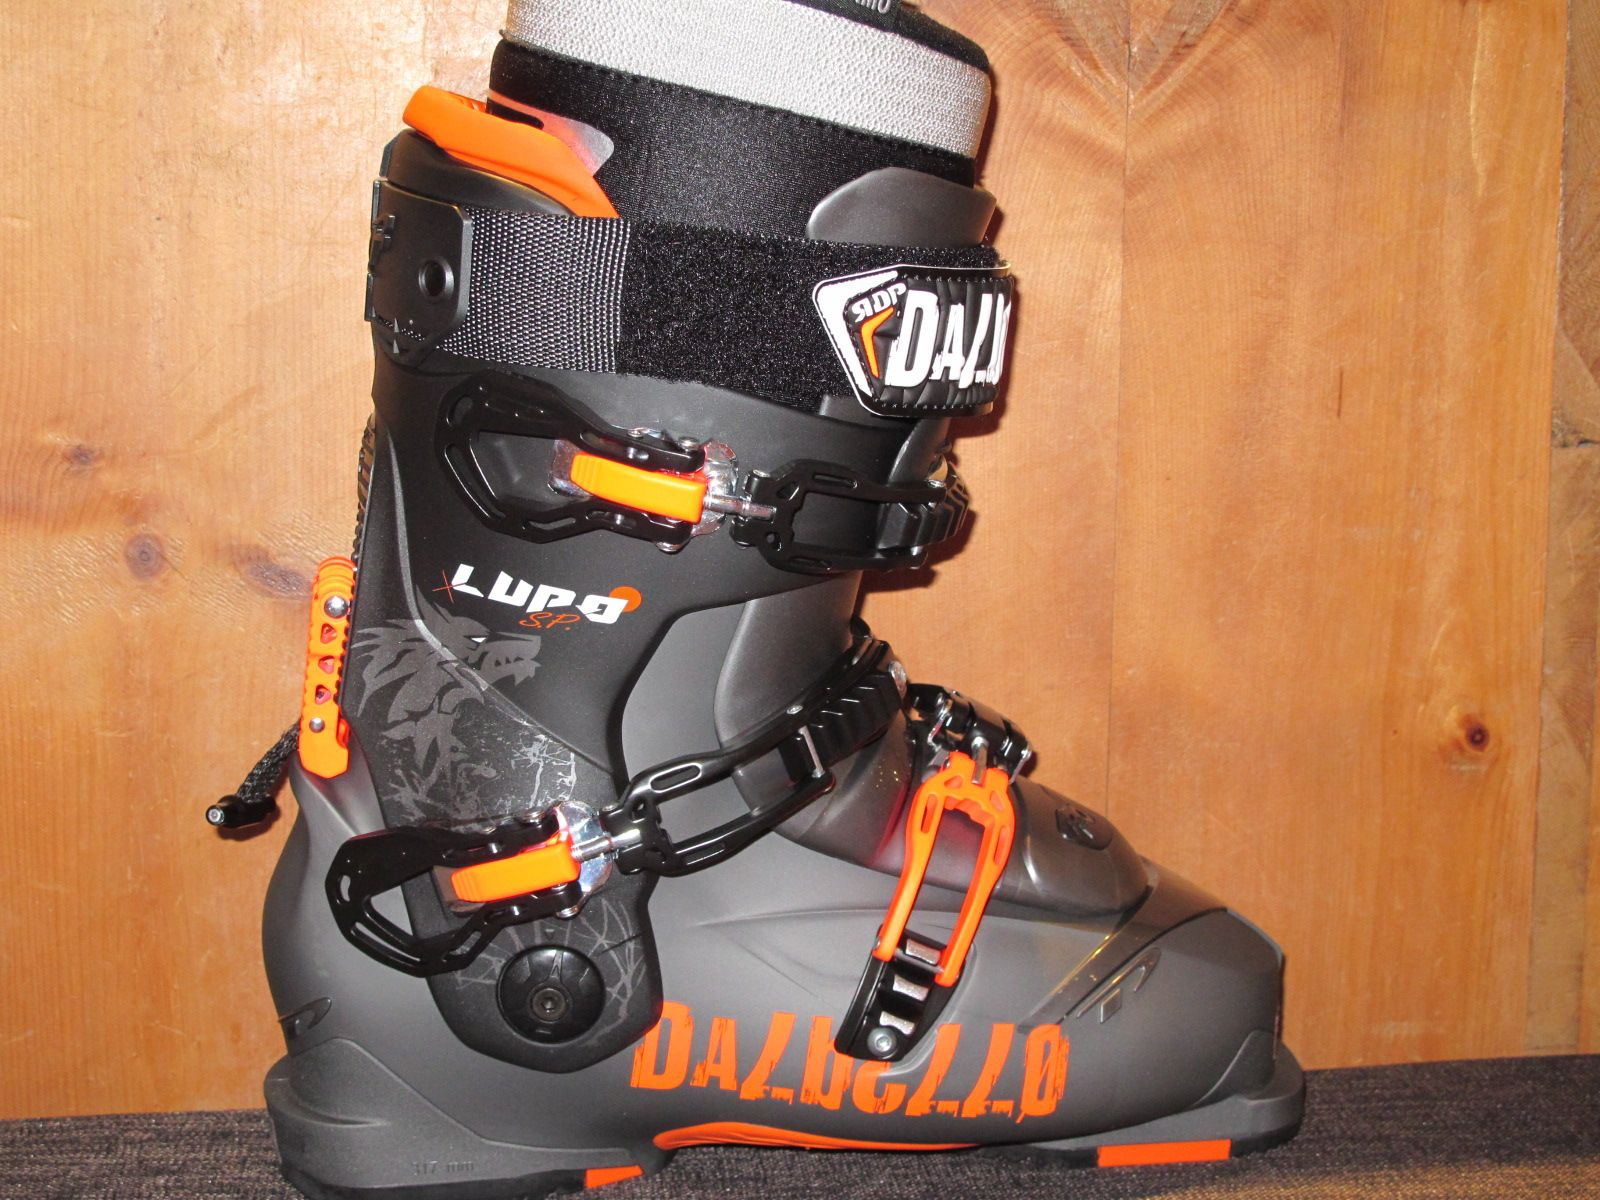 #lupo #panterra #skiboots #dalbello #dalbelloskiboots #madeinitaly #scarponi #skiersempire #ski #snow #freeride #visual #nuoviarrivi